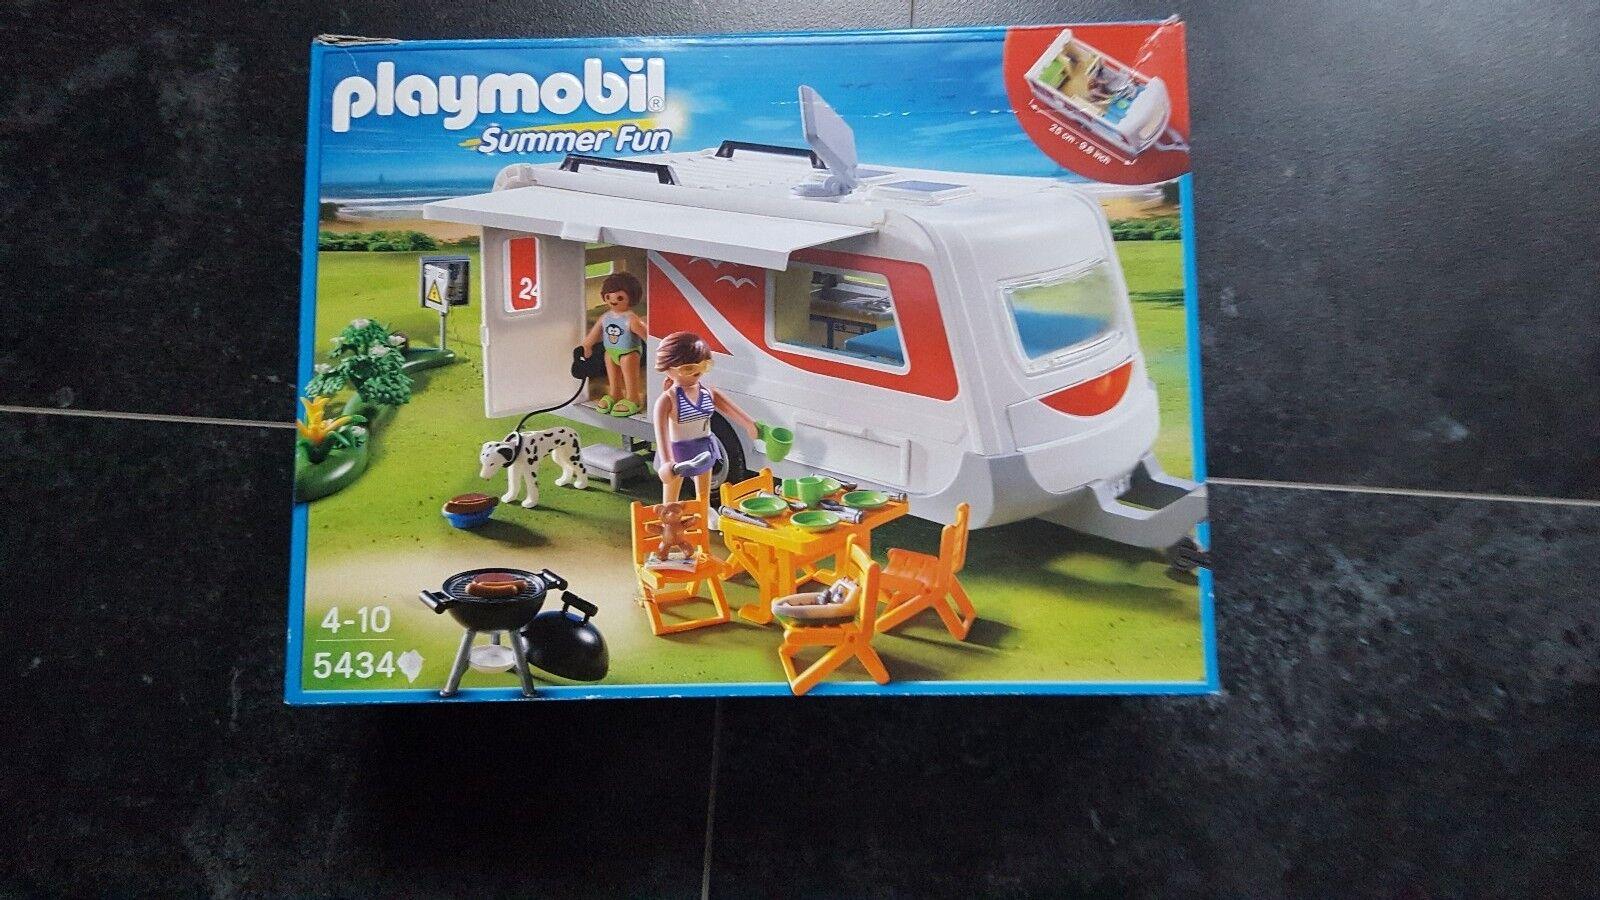 Playmobil summer fun 5434 es sind alle Teile da